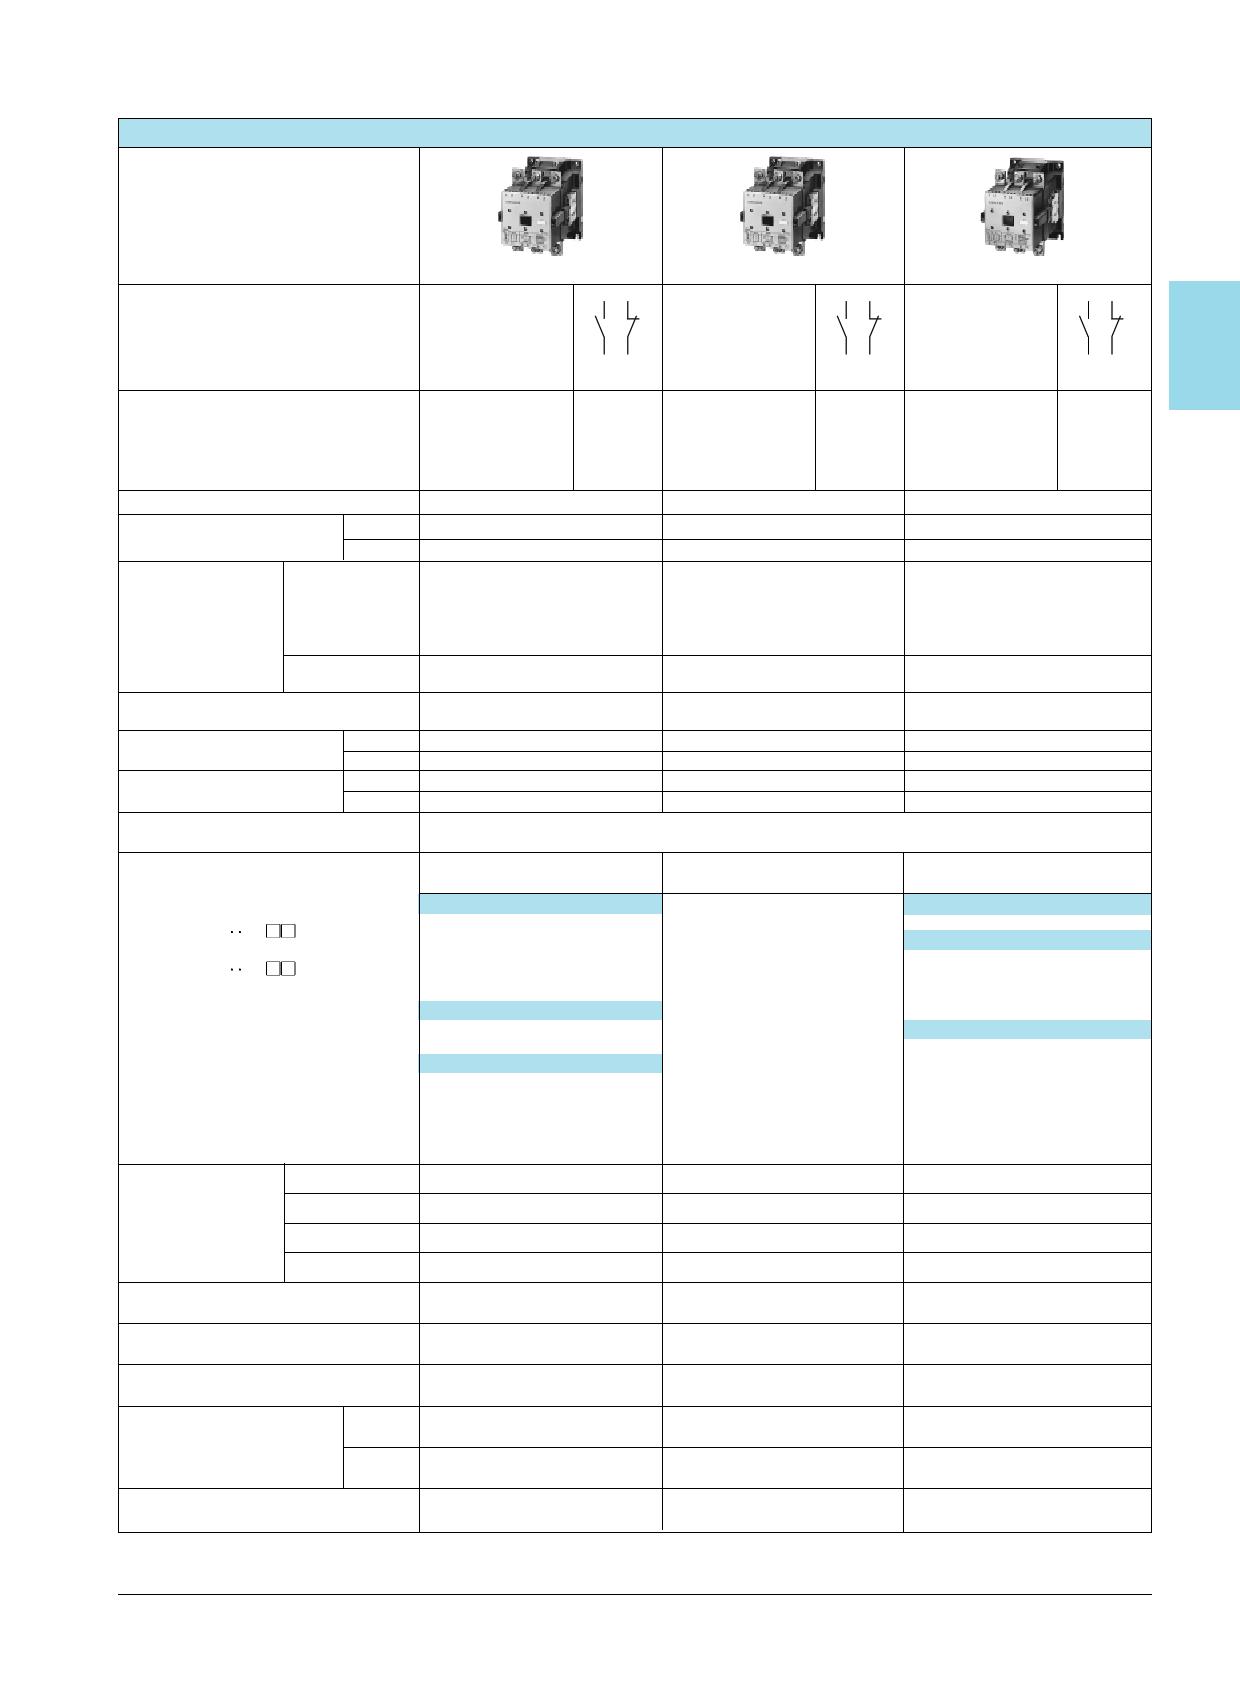 3TF42 Datasheet, Funktion